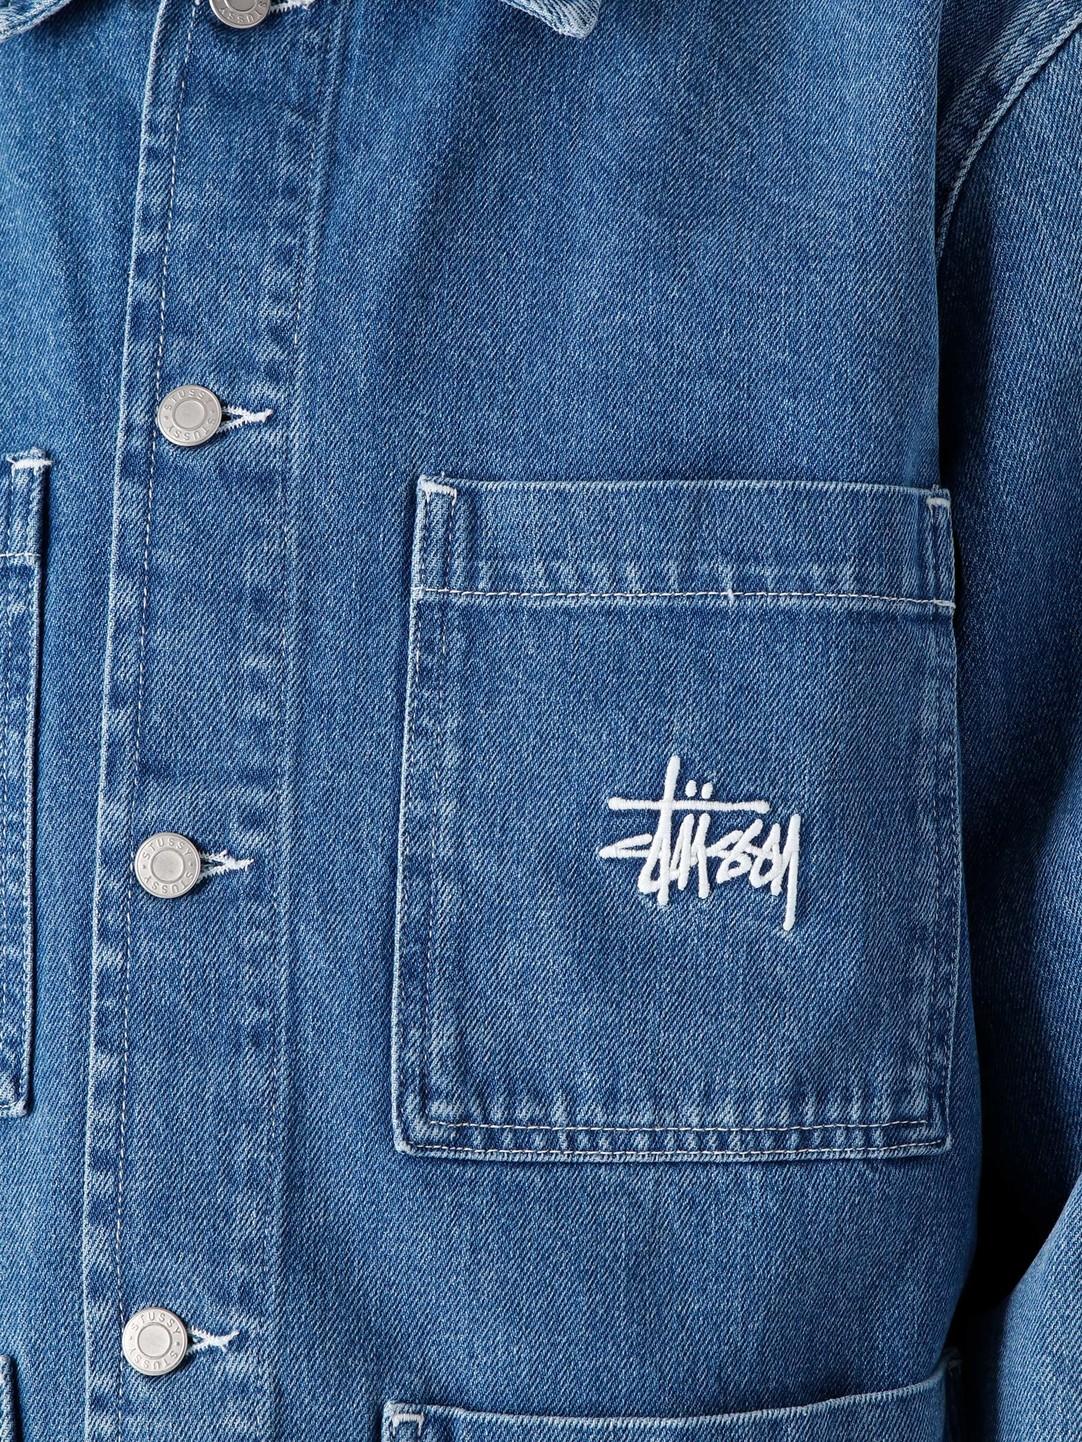 Stussy Stussy Denim Chore Jacket Blue 115570-0801